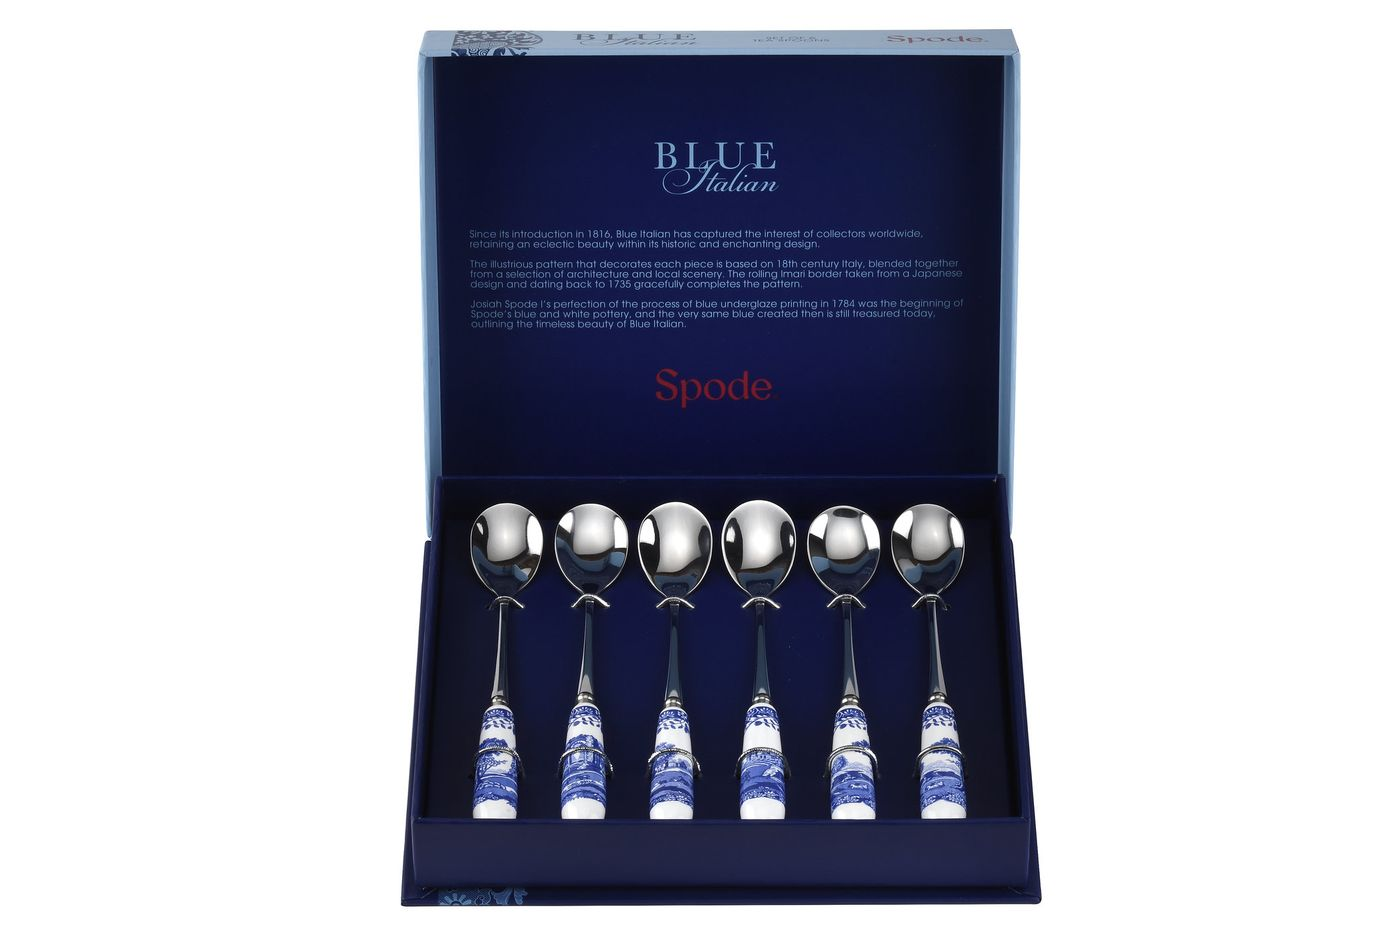 Spode Blue Italian Tea Spoon Set Set of 6 thumb 2